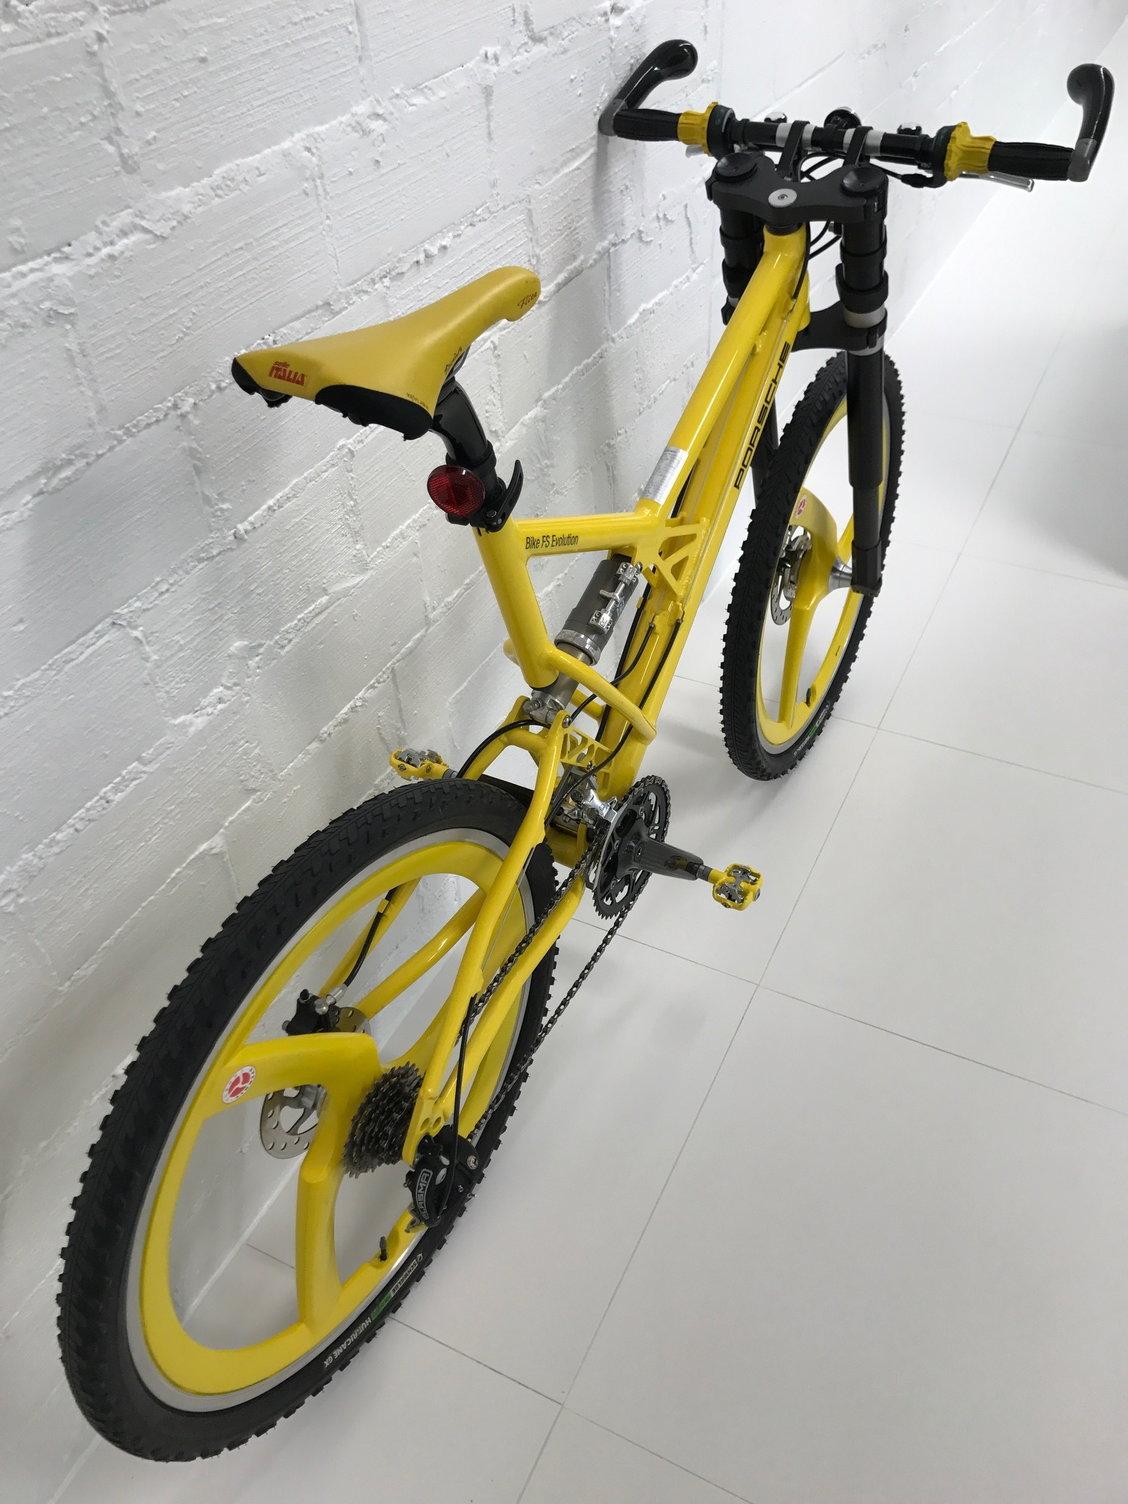 fs porsche bike evolution fs mountain bike 51cm. Black Bedroom Furniture Sets. Home Design Ideas